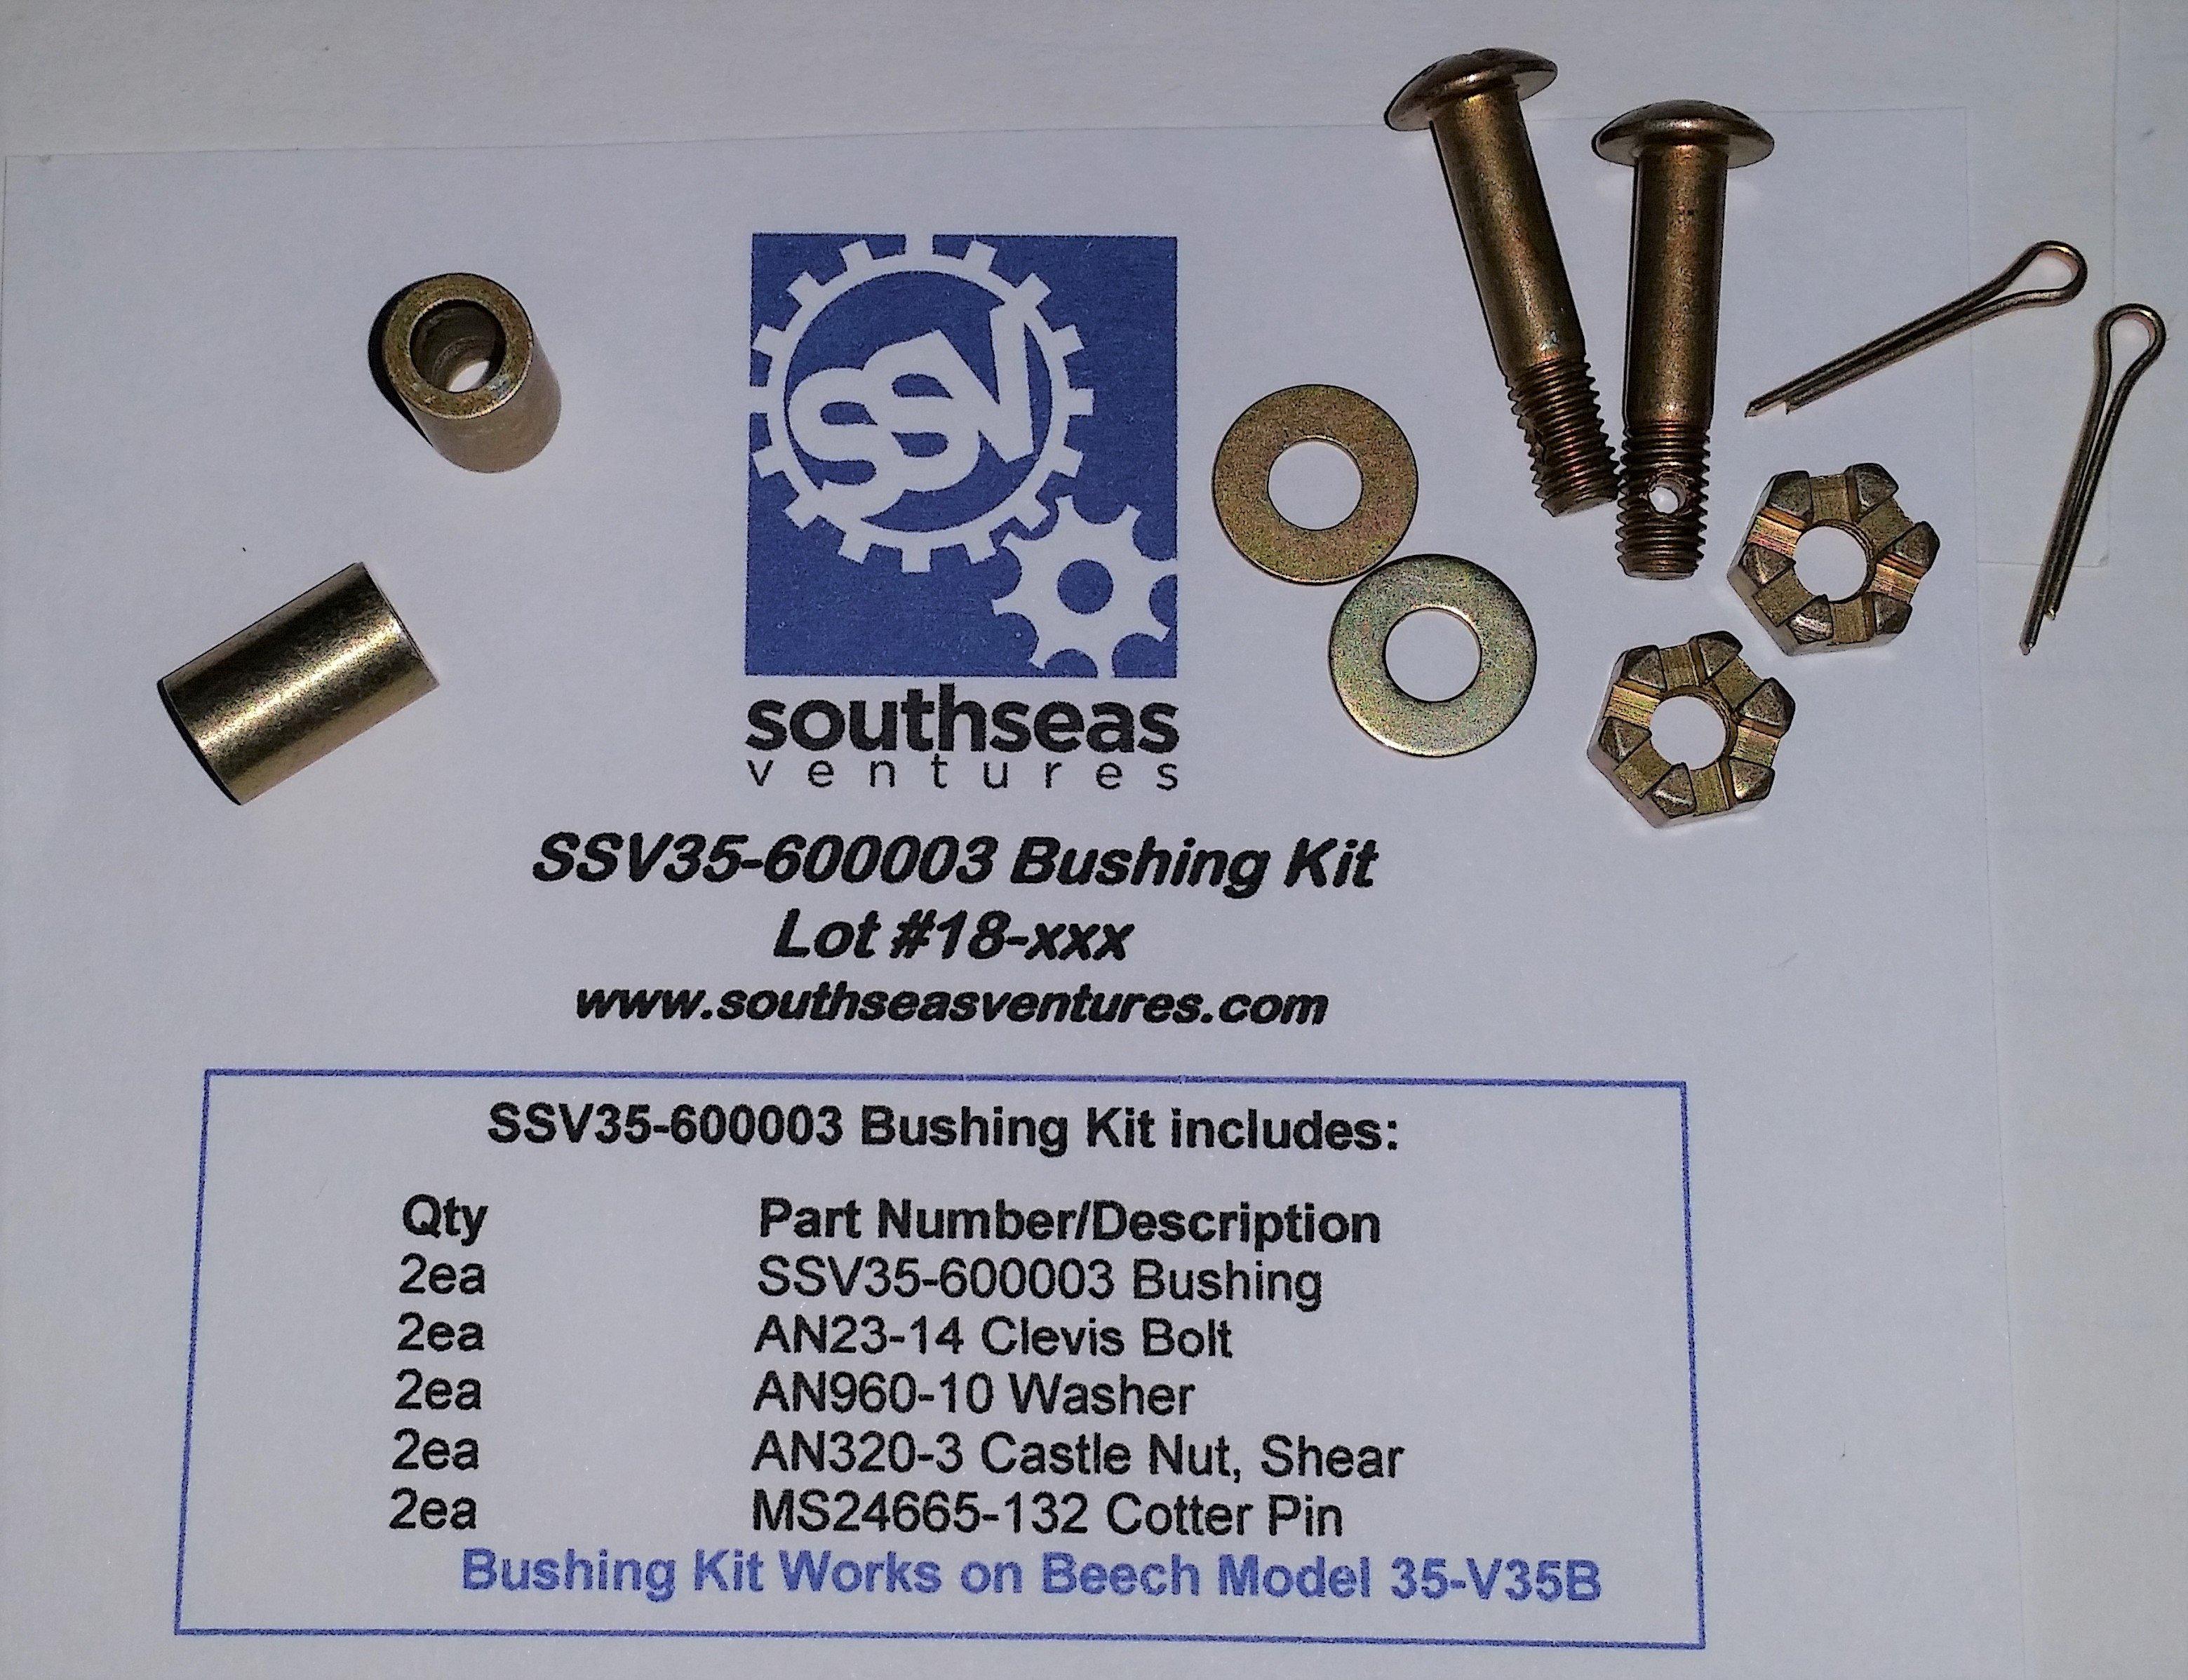 SSV35-600003 Bushing Kit 58762